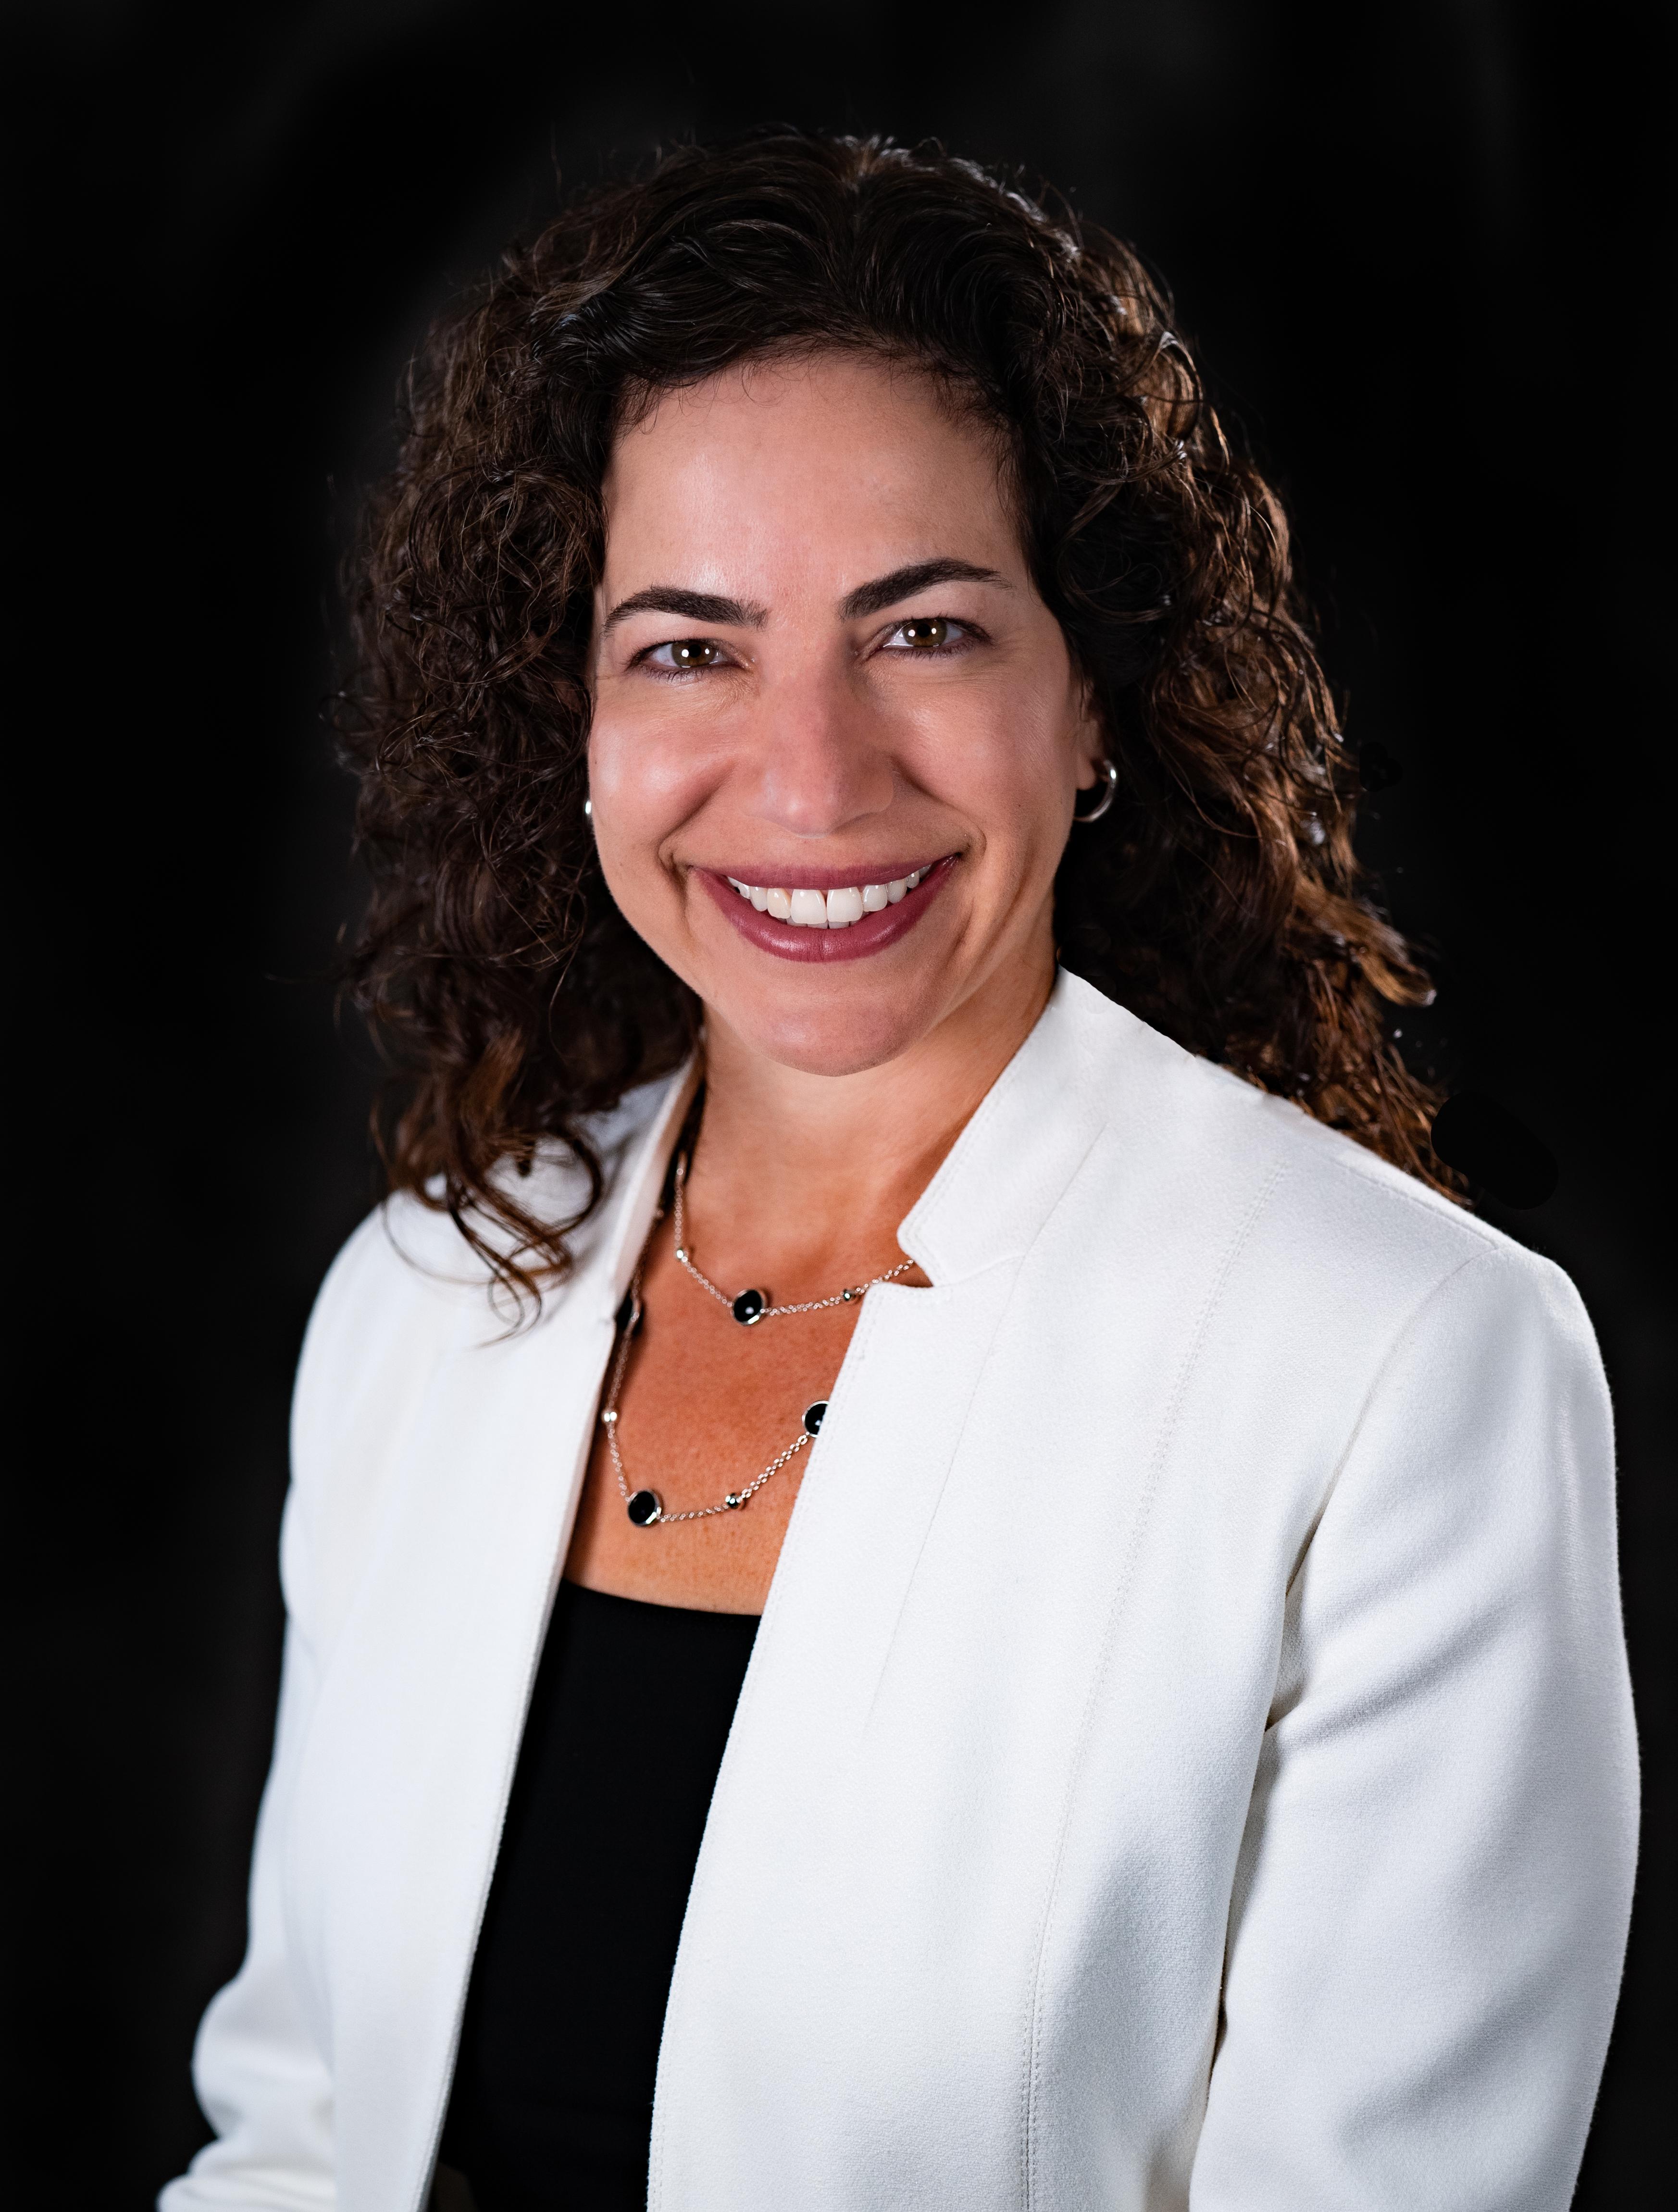 Jacqueline Mesa